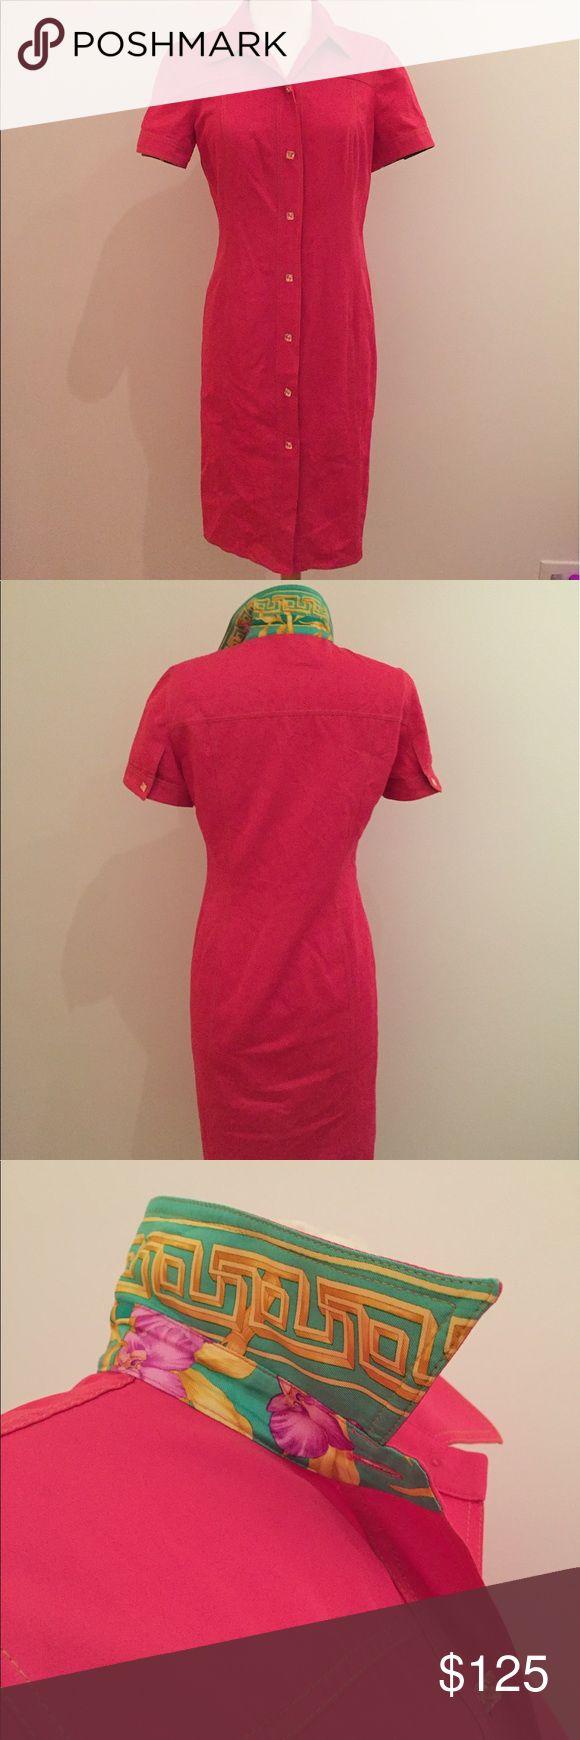 Vinatage Gianni Versace Shirt Dress Pink shirt dress with green printed sleeves and collar facings. Vintage. Versace Dresses